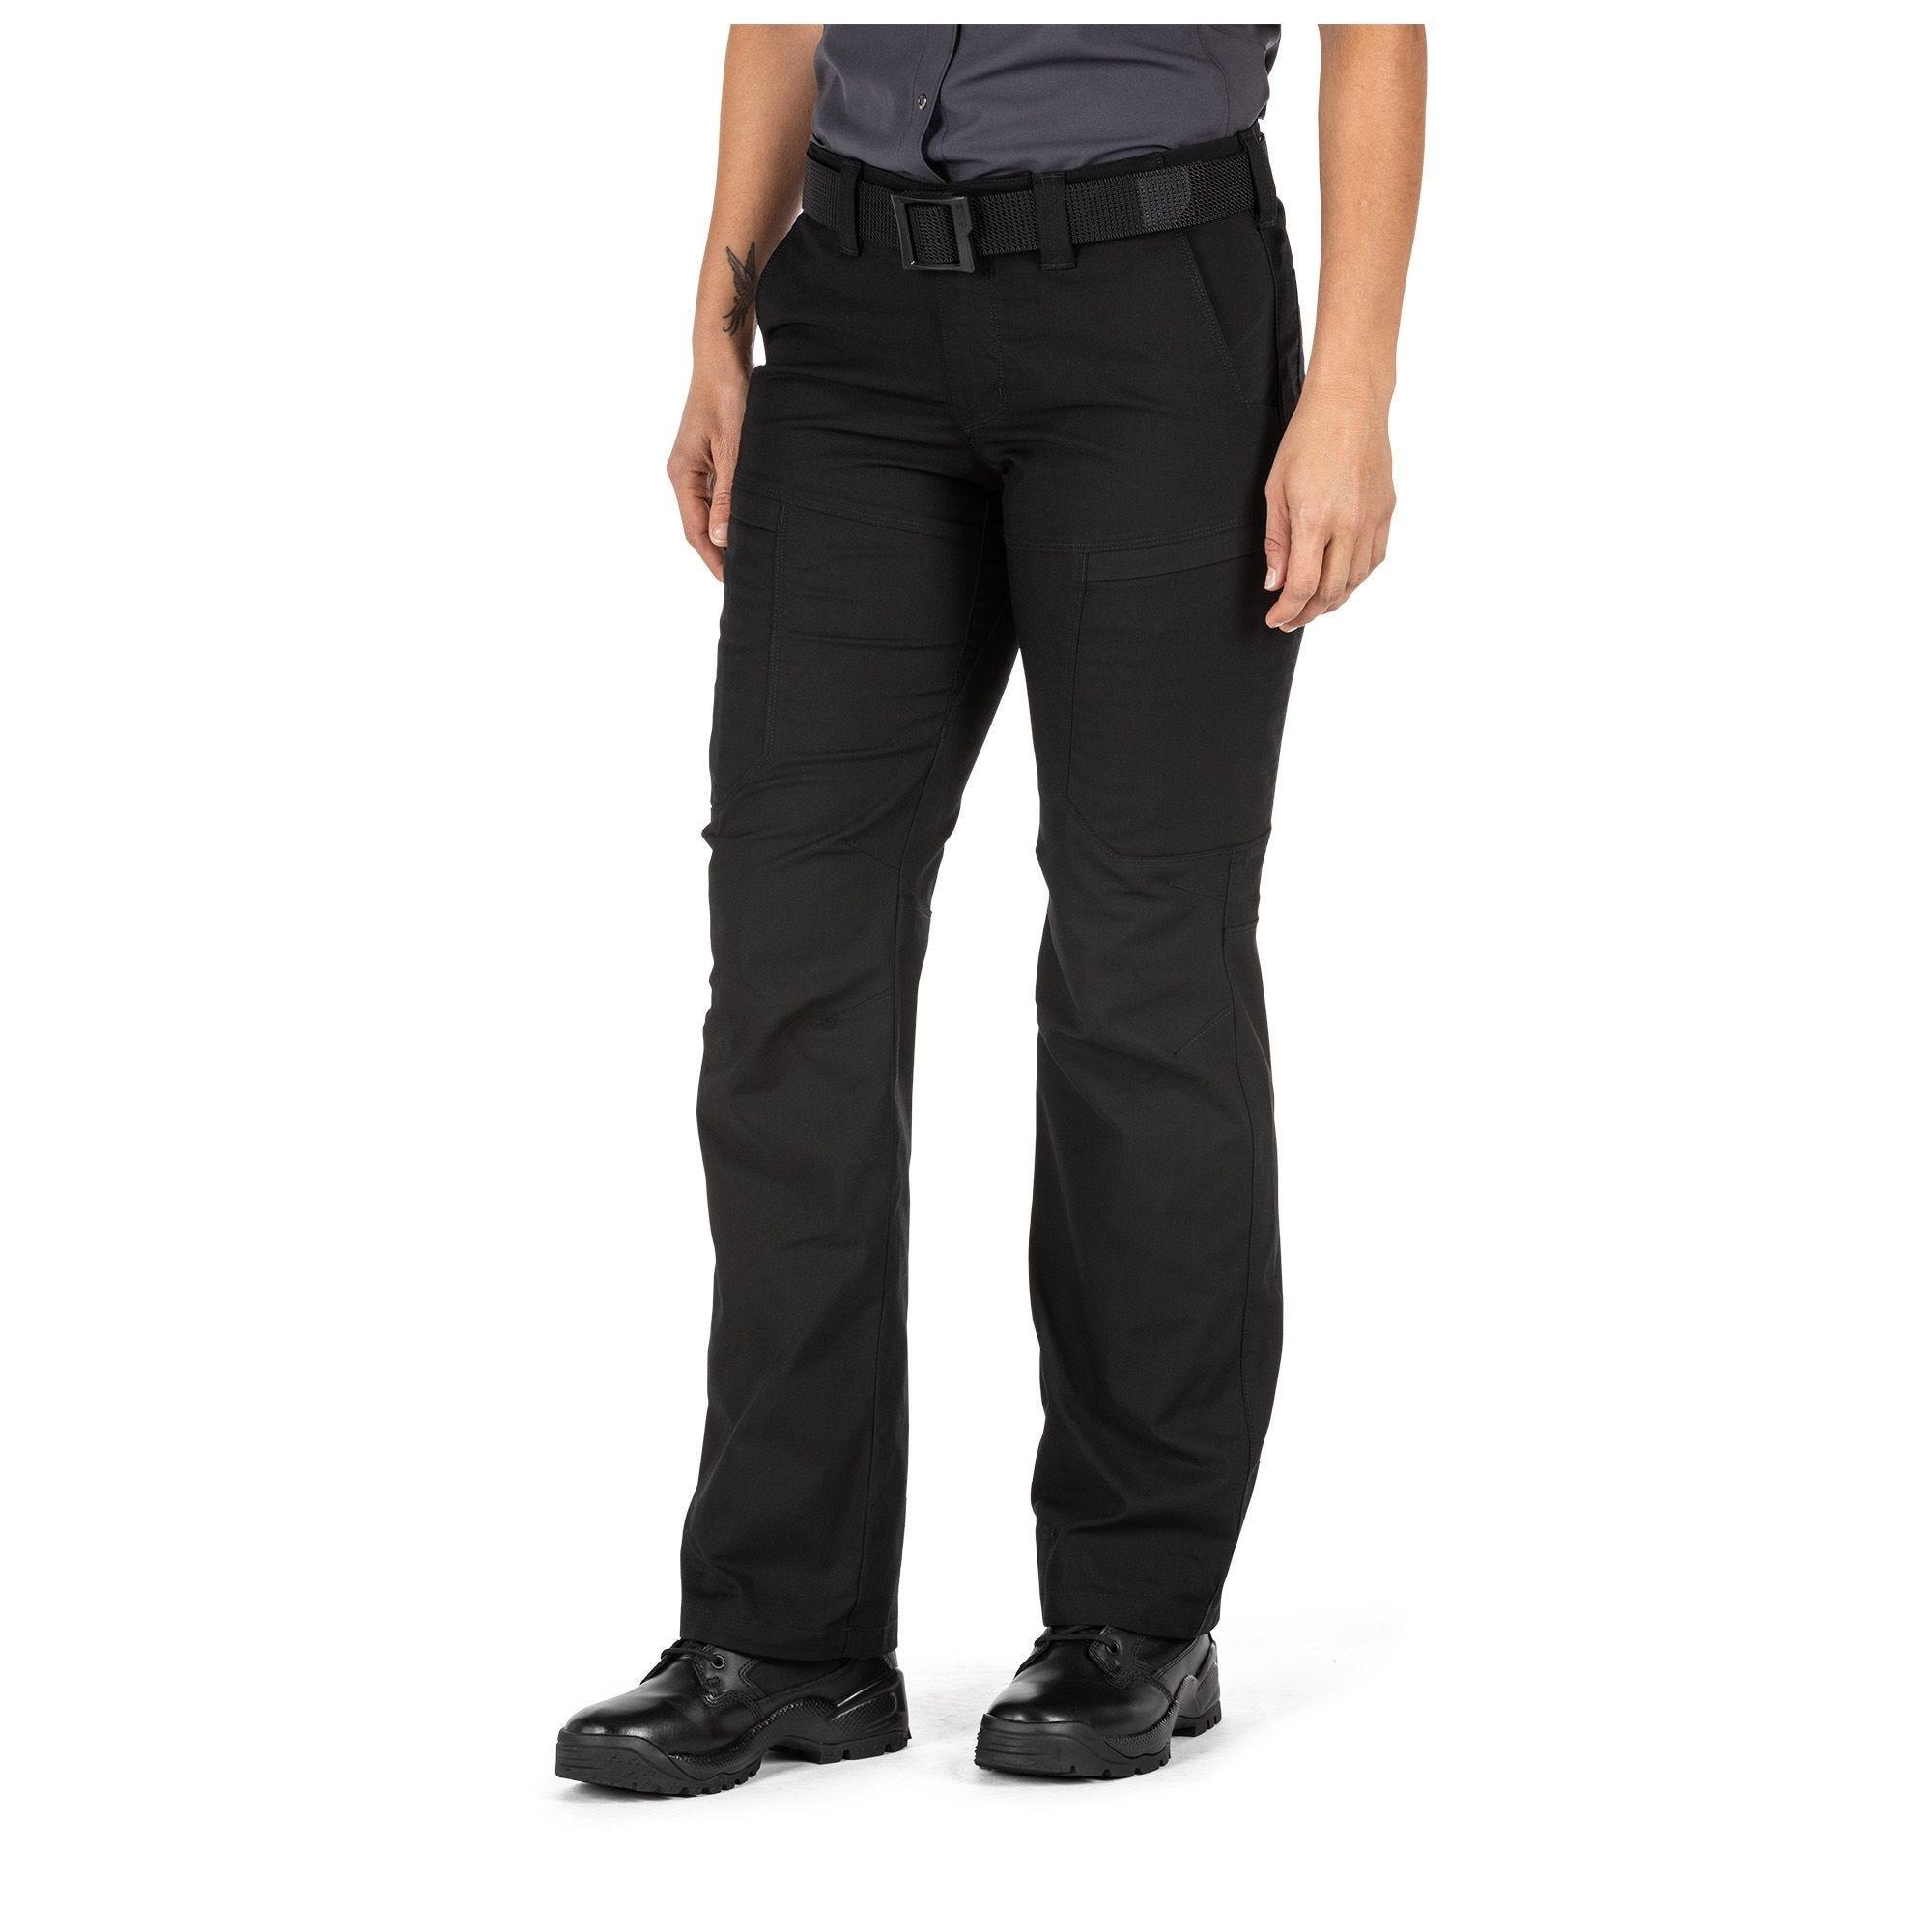 5.11 Tactical 5.11 Tactical Women's 5.11 Apex Pant - Black